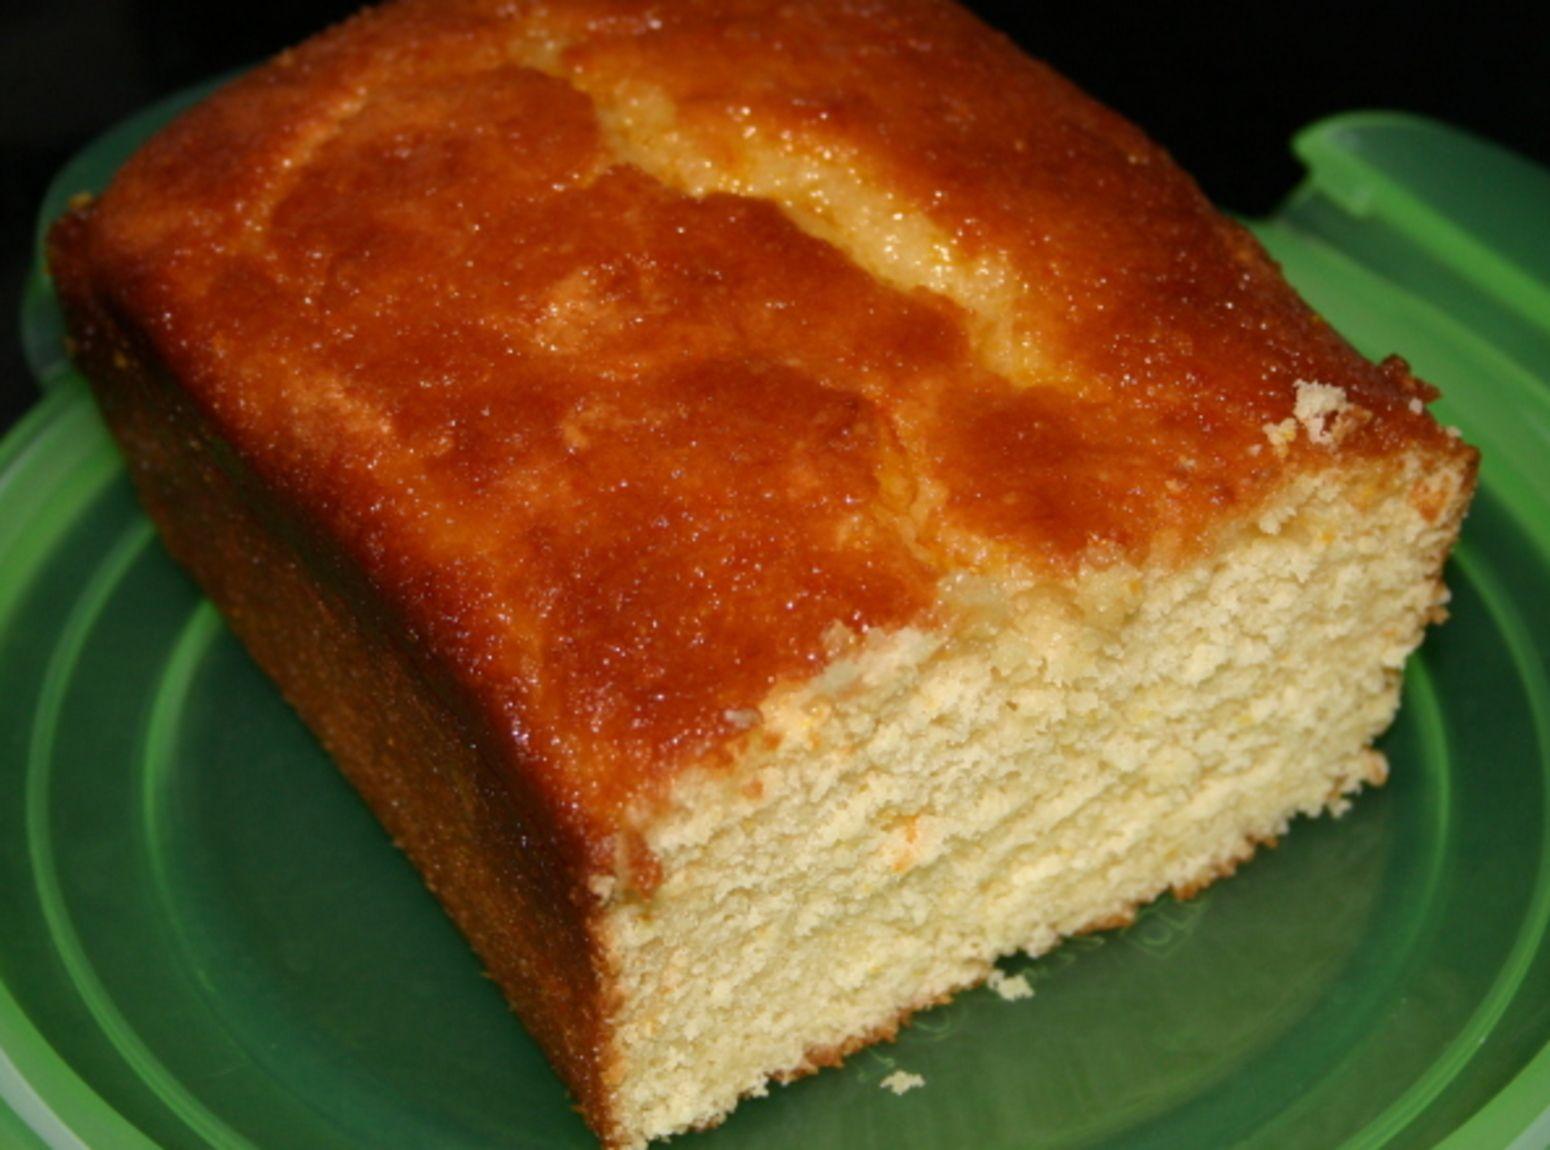 Yummy...  Orange Cream Cheese Bread